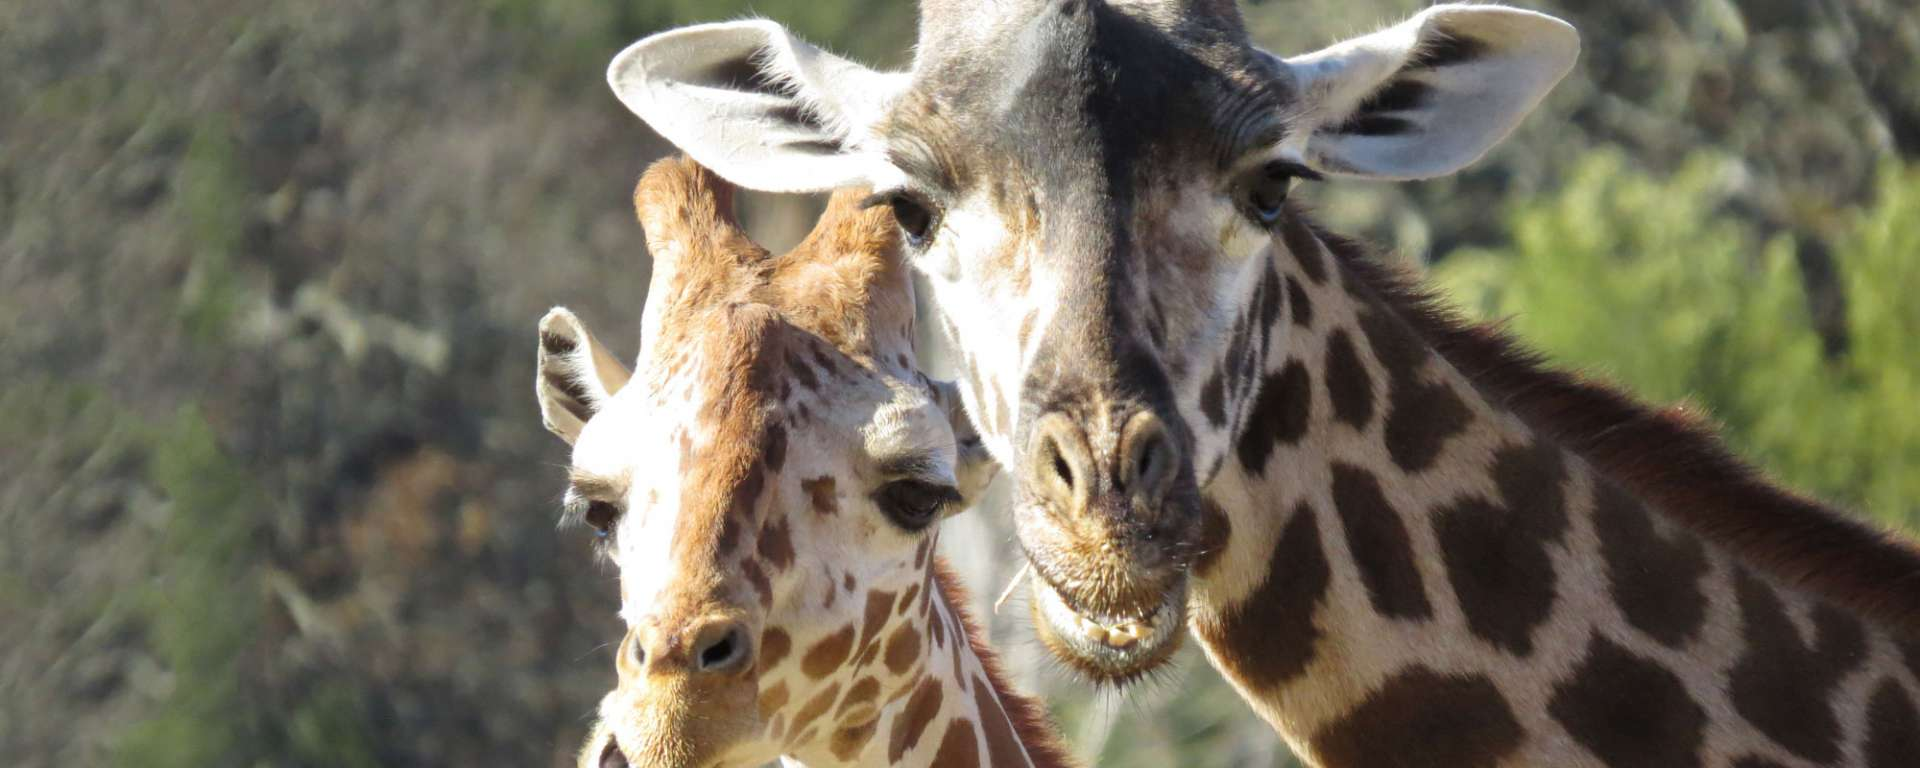 Giraffes Conservation Corner Taxonomy